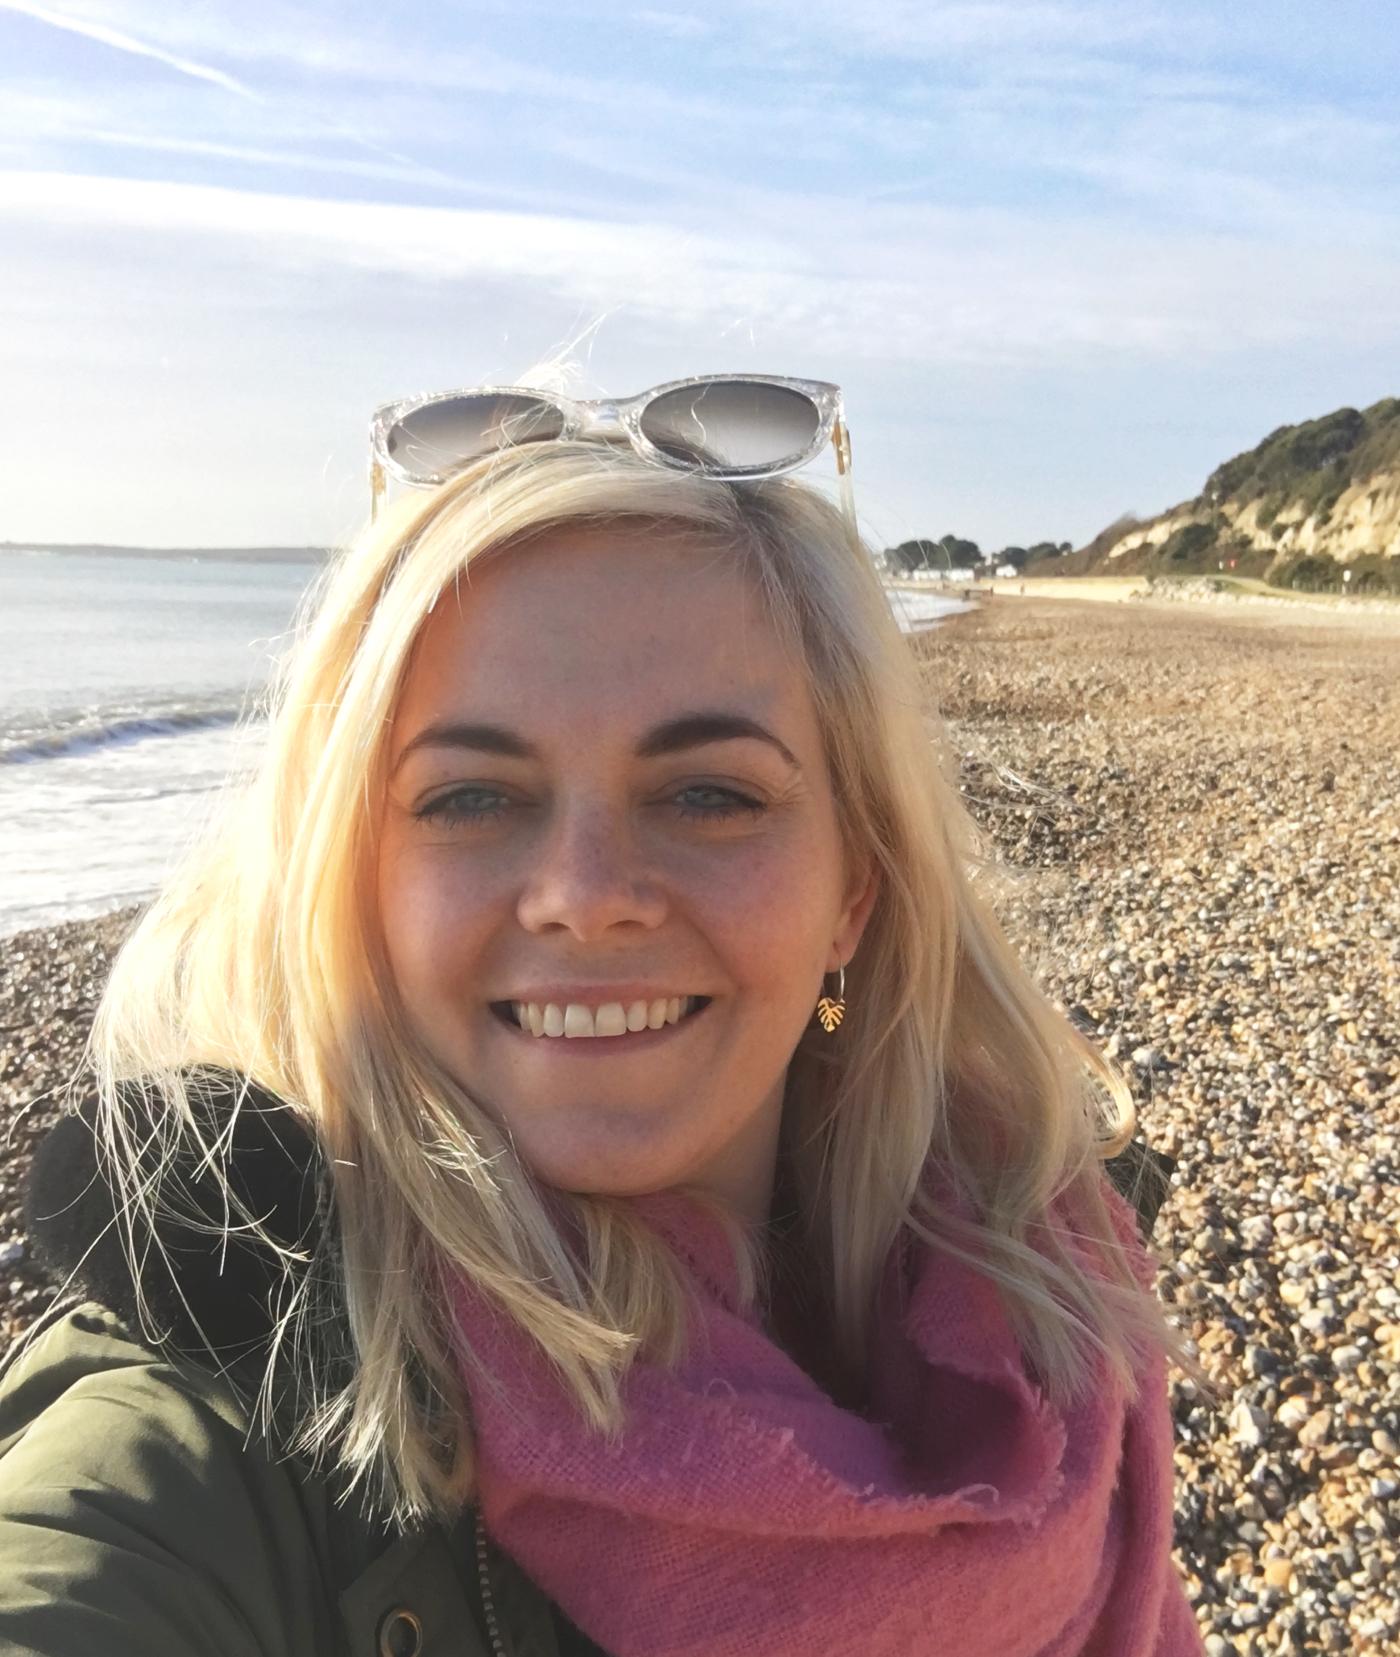 avon beach selfie